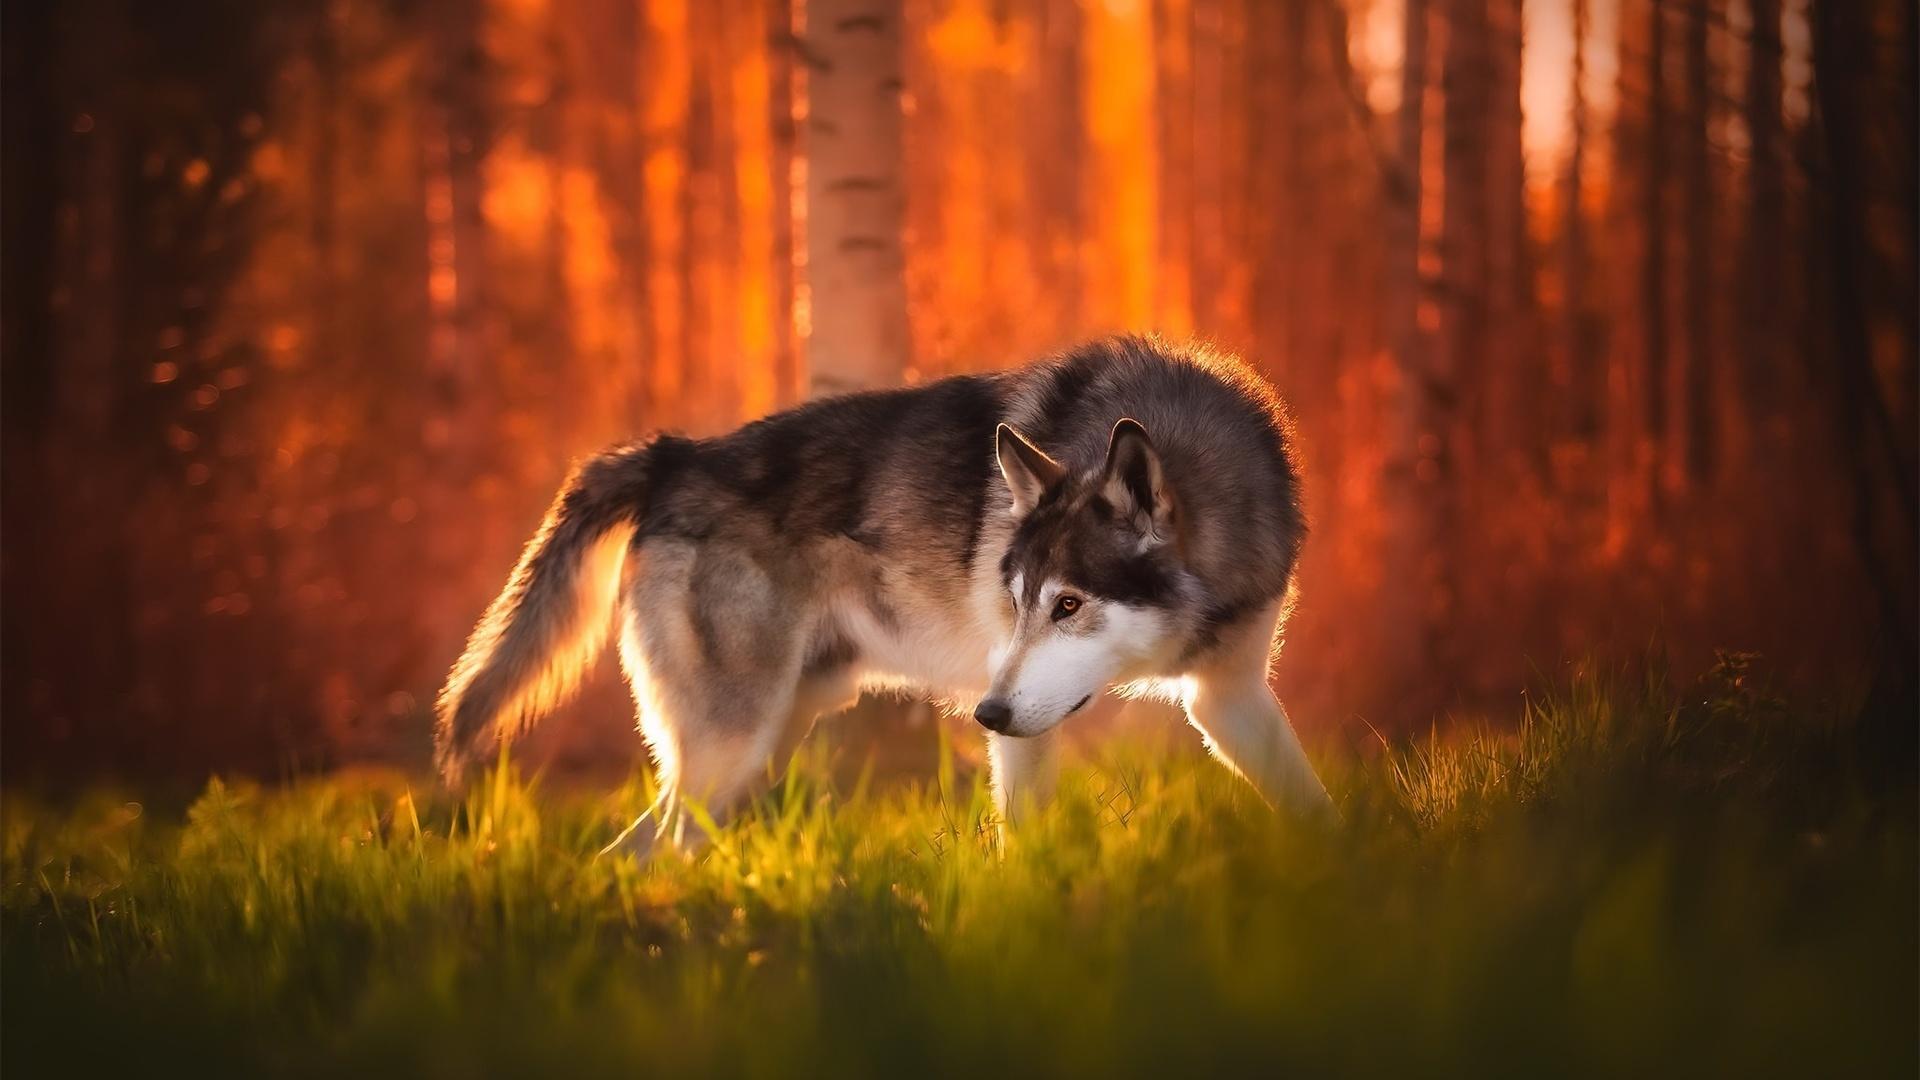 siberian husky, autumn, pets, cute animals, bokeh, forest, husky, cute dog, dogs, siberian husky